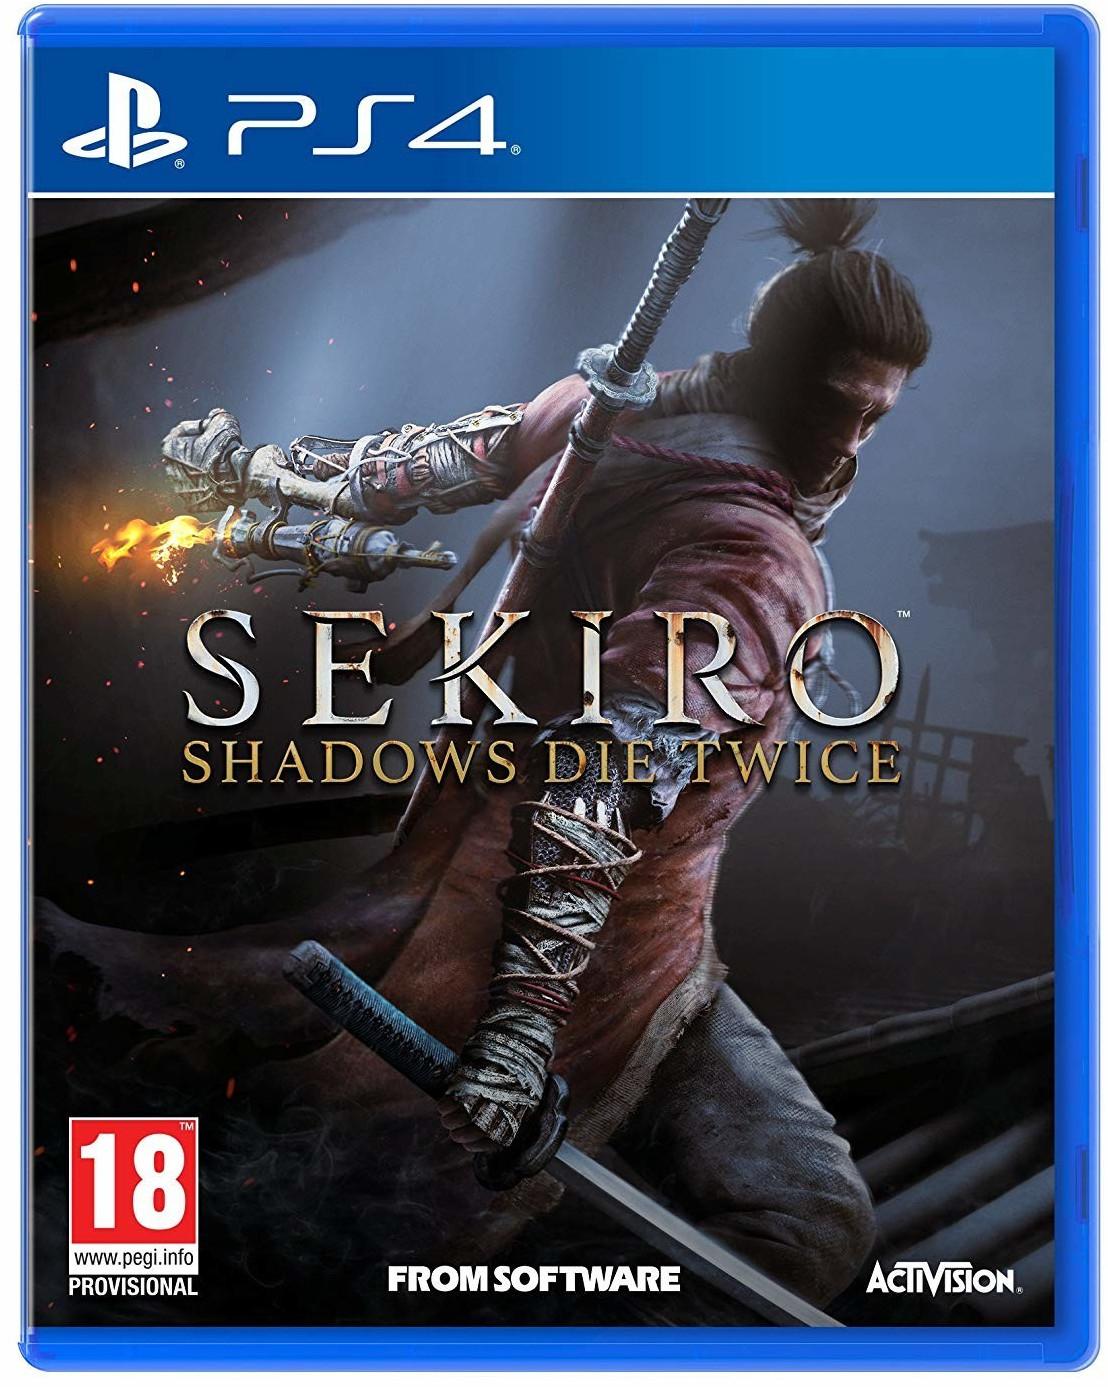 Sekiro: Shadows Die Twice sur PS4 et Xbox One